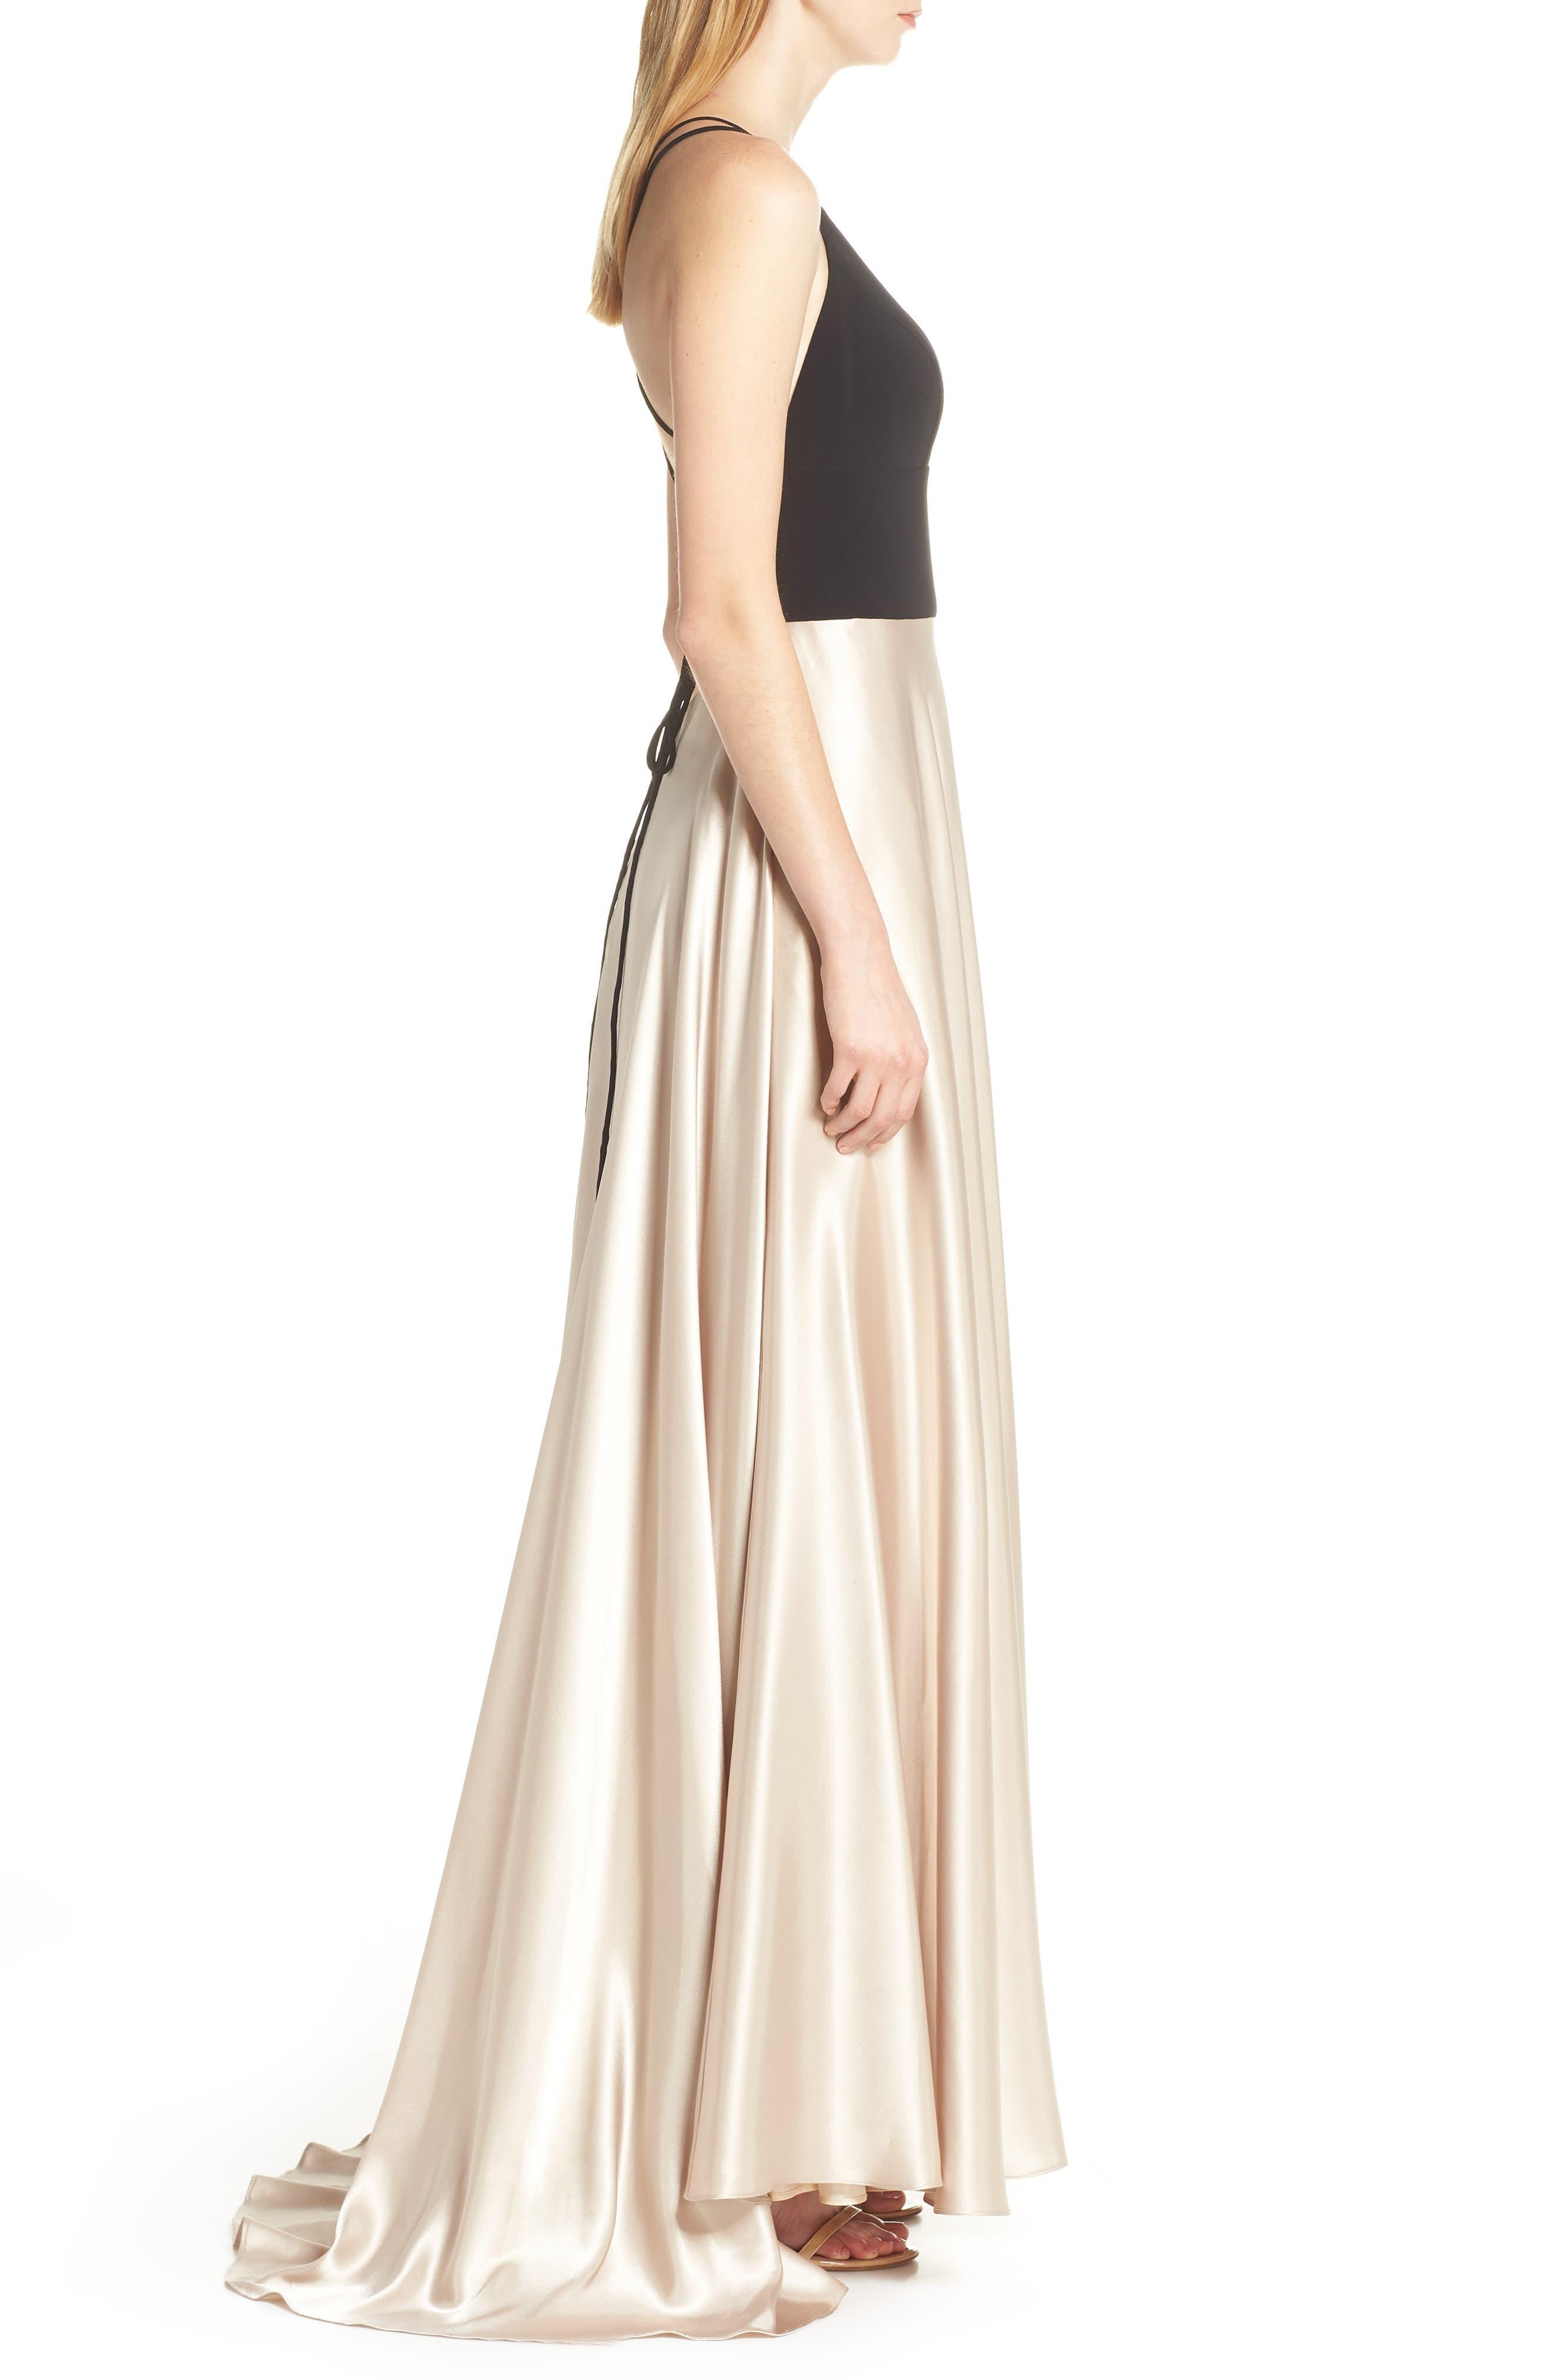 BLONDIE NITES, Strappy Back Crepe & Charmeuse Evening Dress, Alternate thumbnail 4, color, BLACK/ GOLD